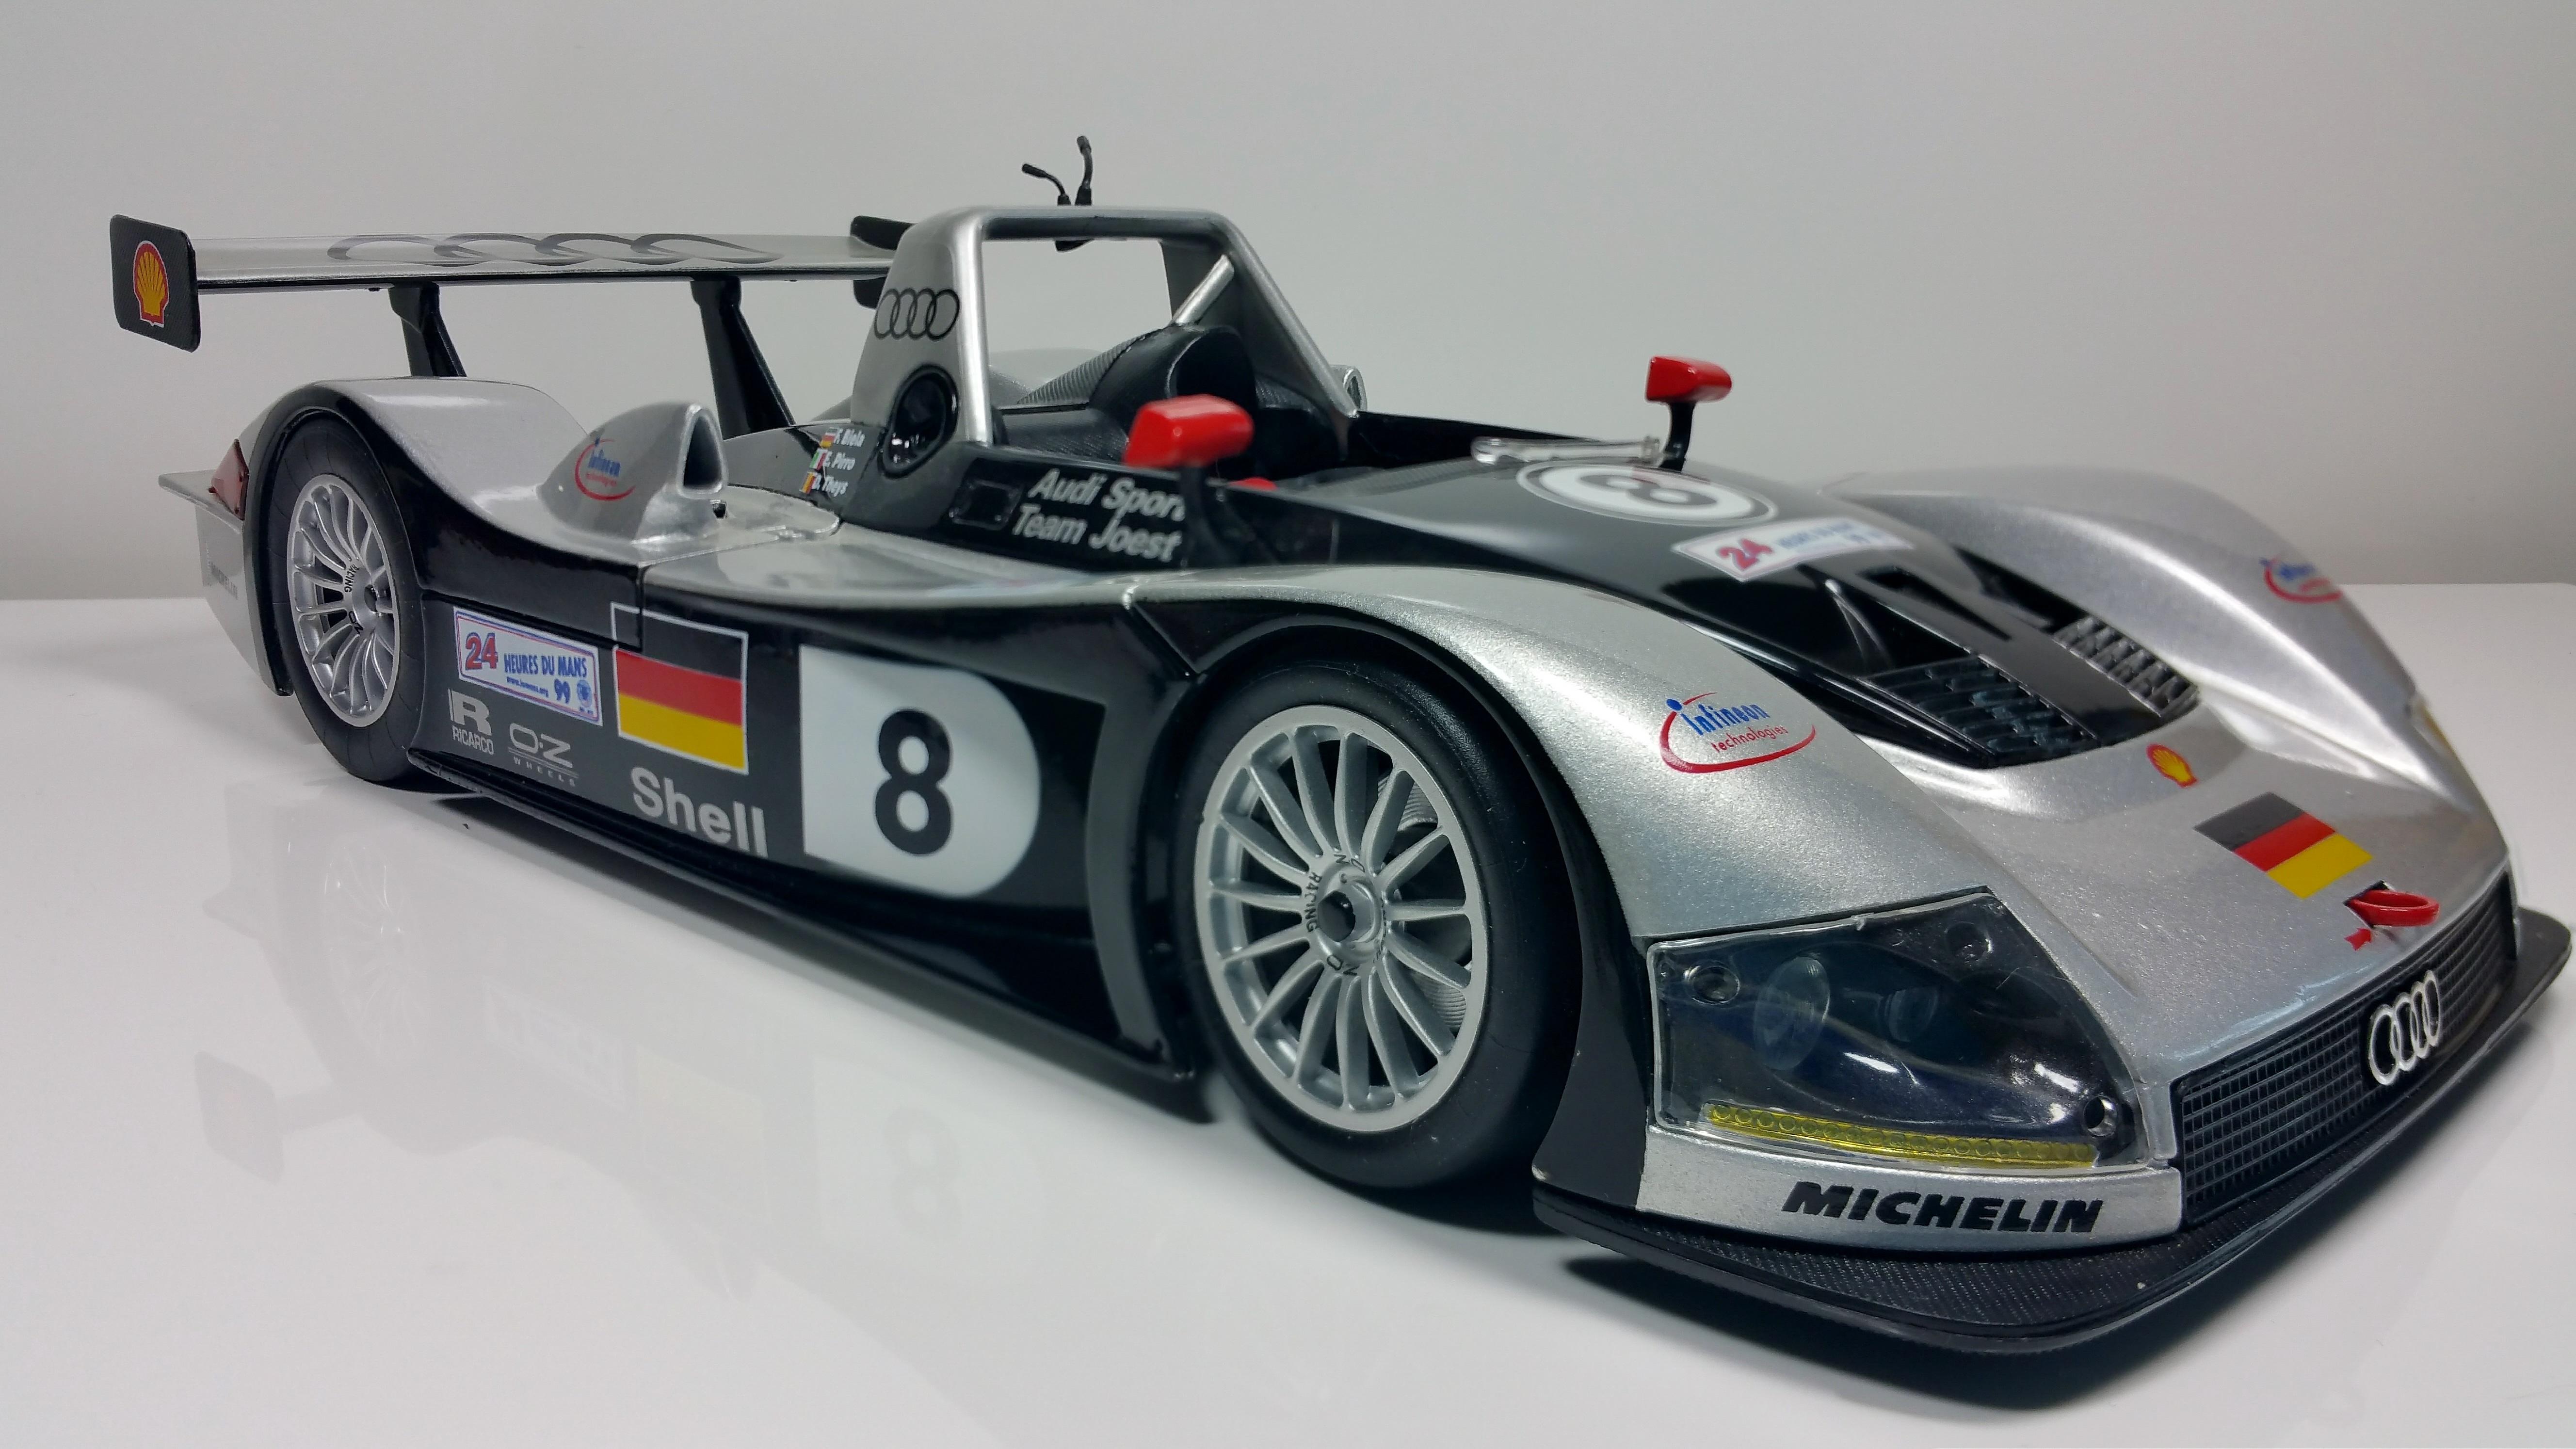 Free Images : auto, sports car, race car, supercar, silver, 1999 ...